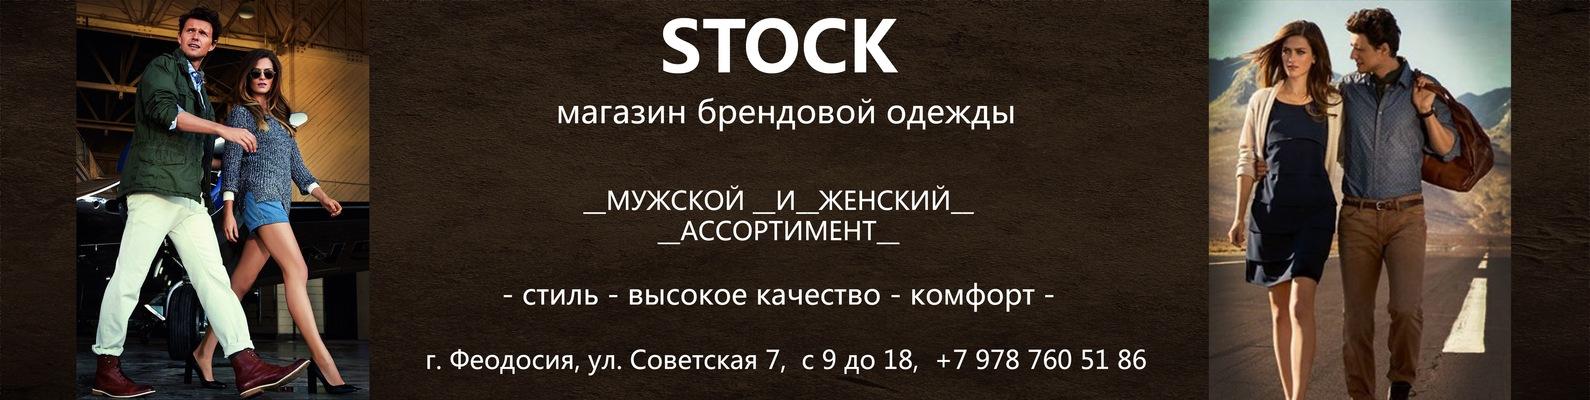 e0b893a9c2ae2 STOCKFeo _ Магазин_брендовой_одежды   ВКонтакте